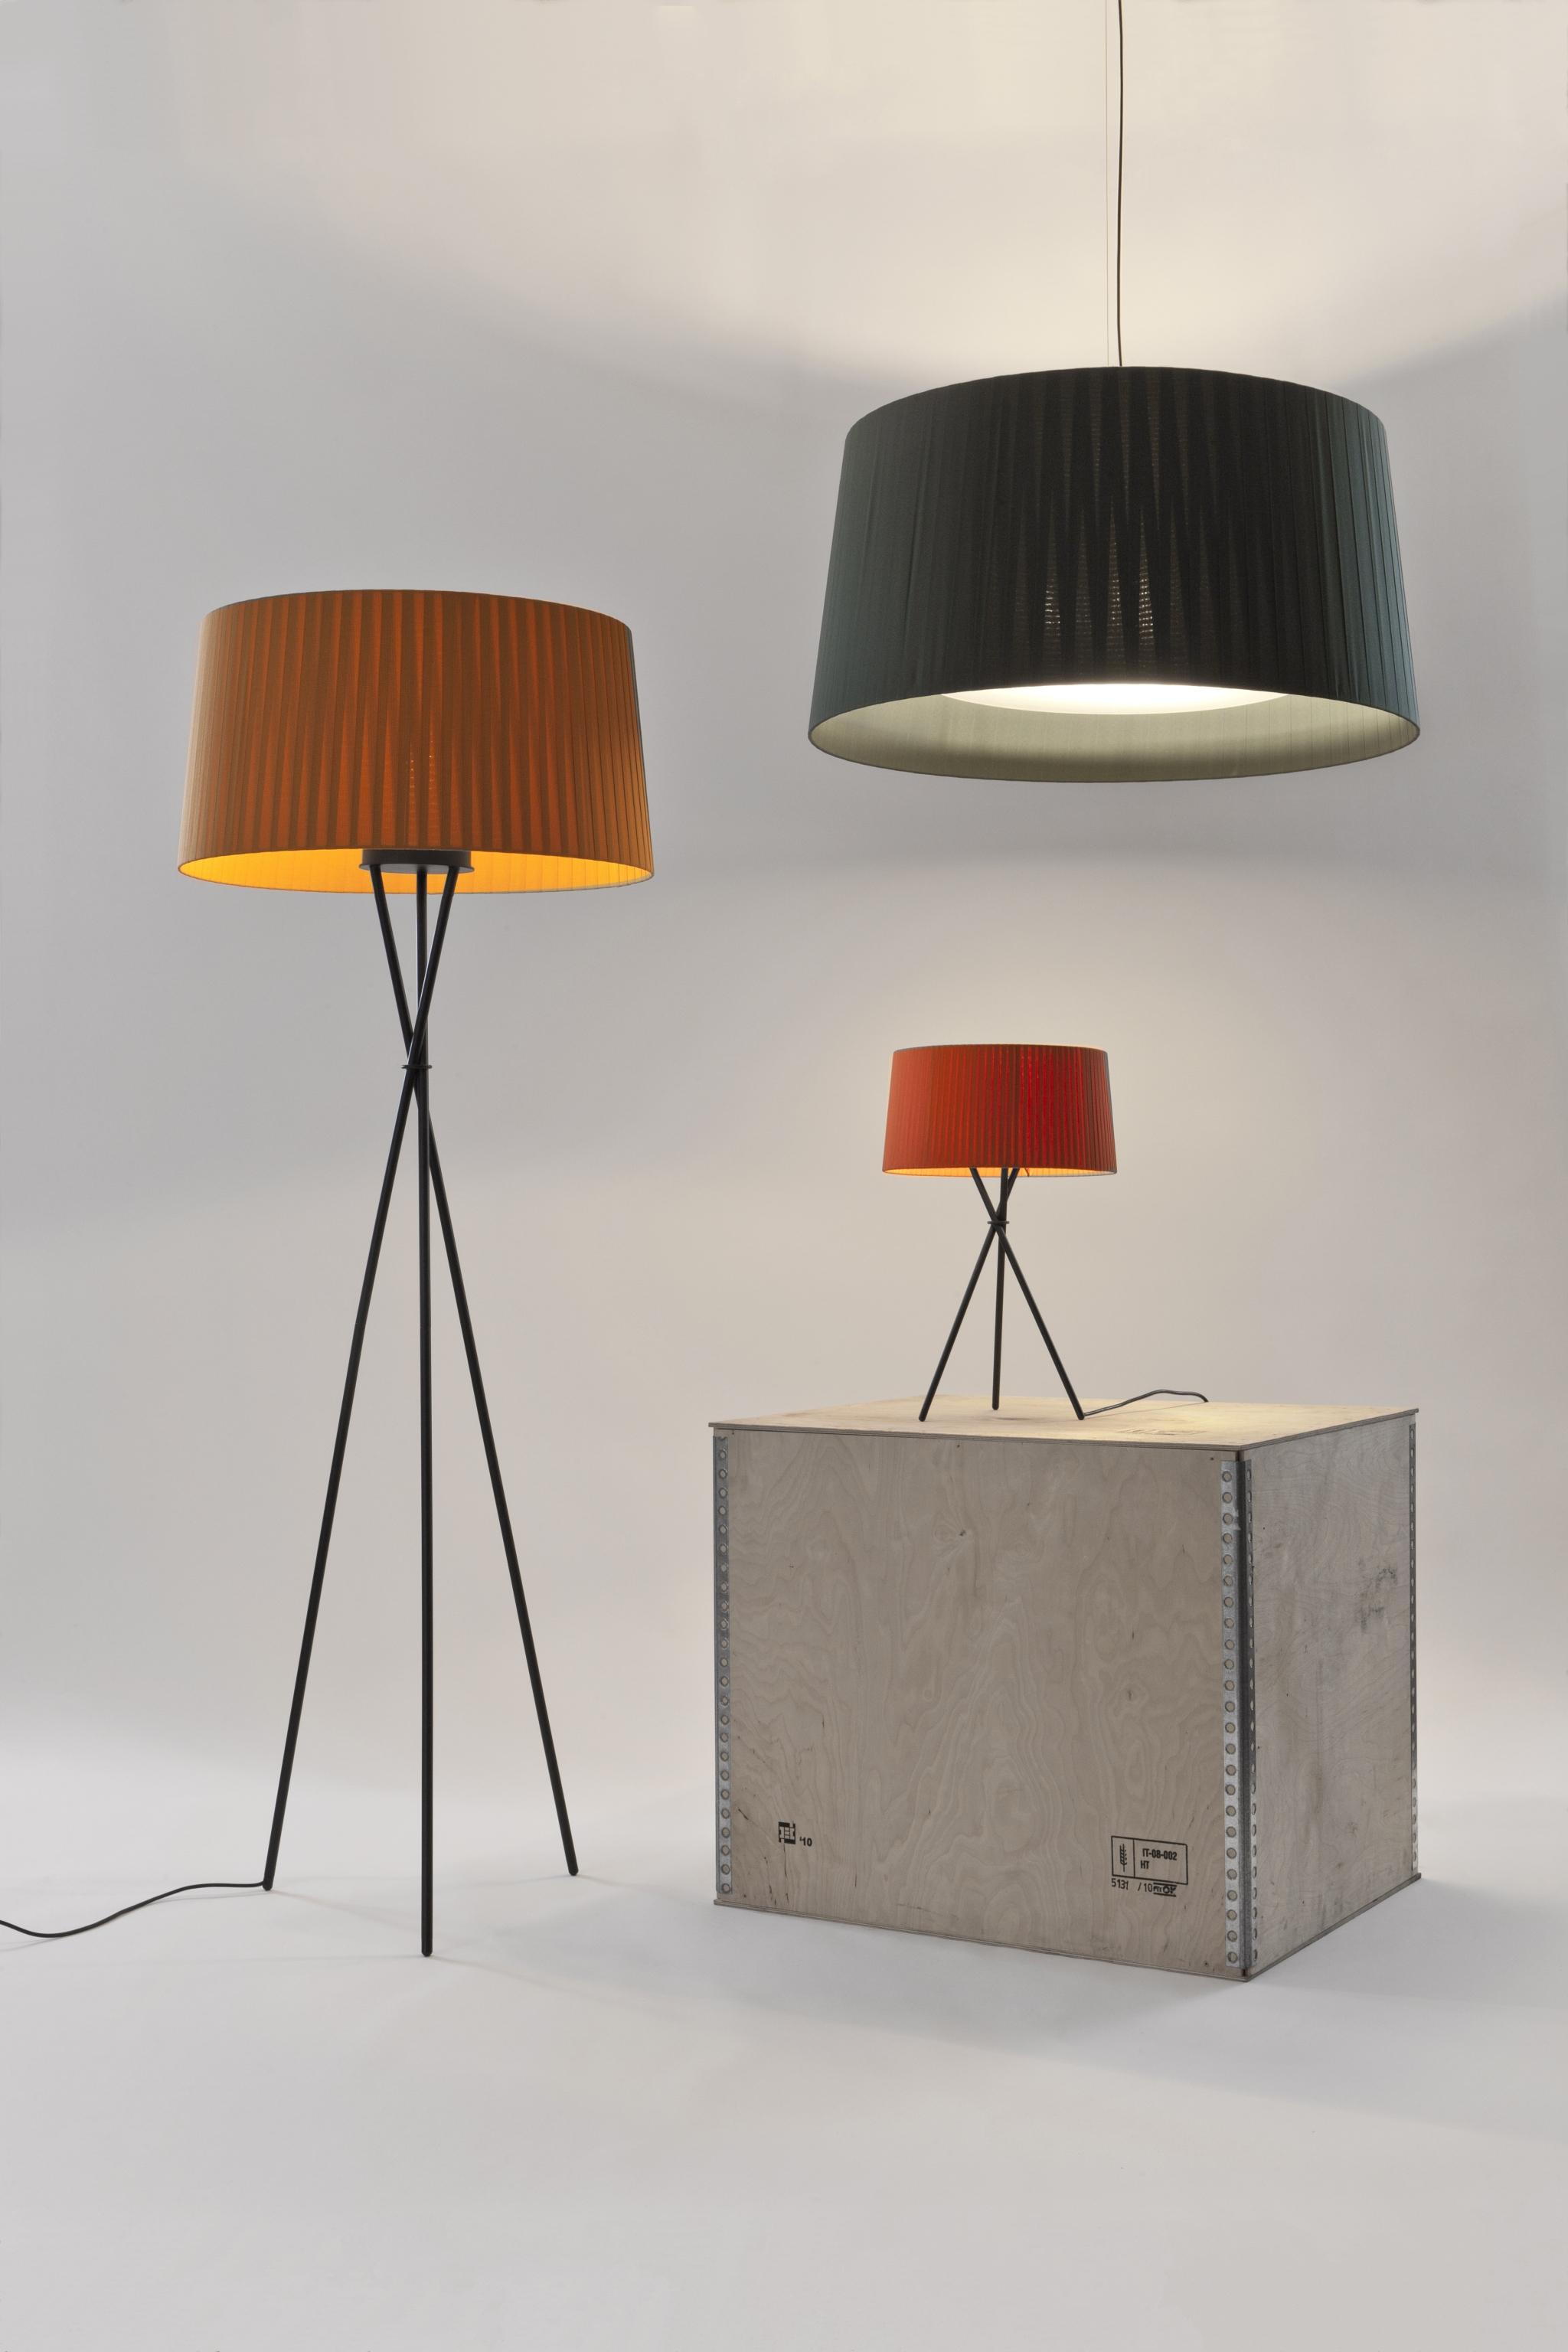 kl philips led index lighting stick bulb kuala lumpur distributor lamp